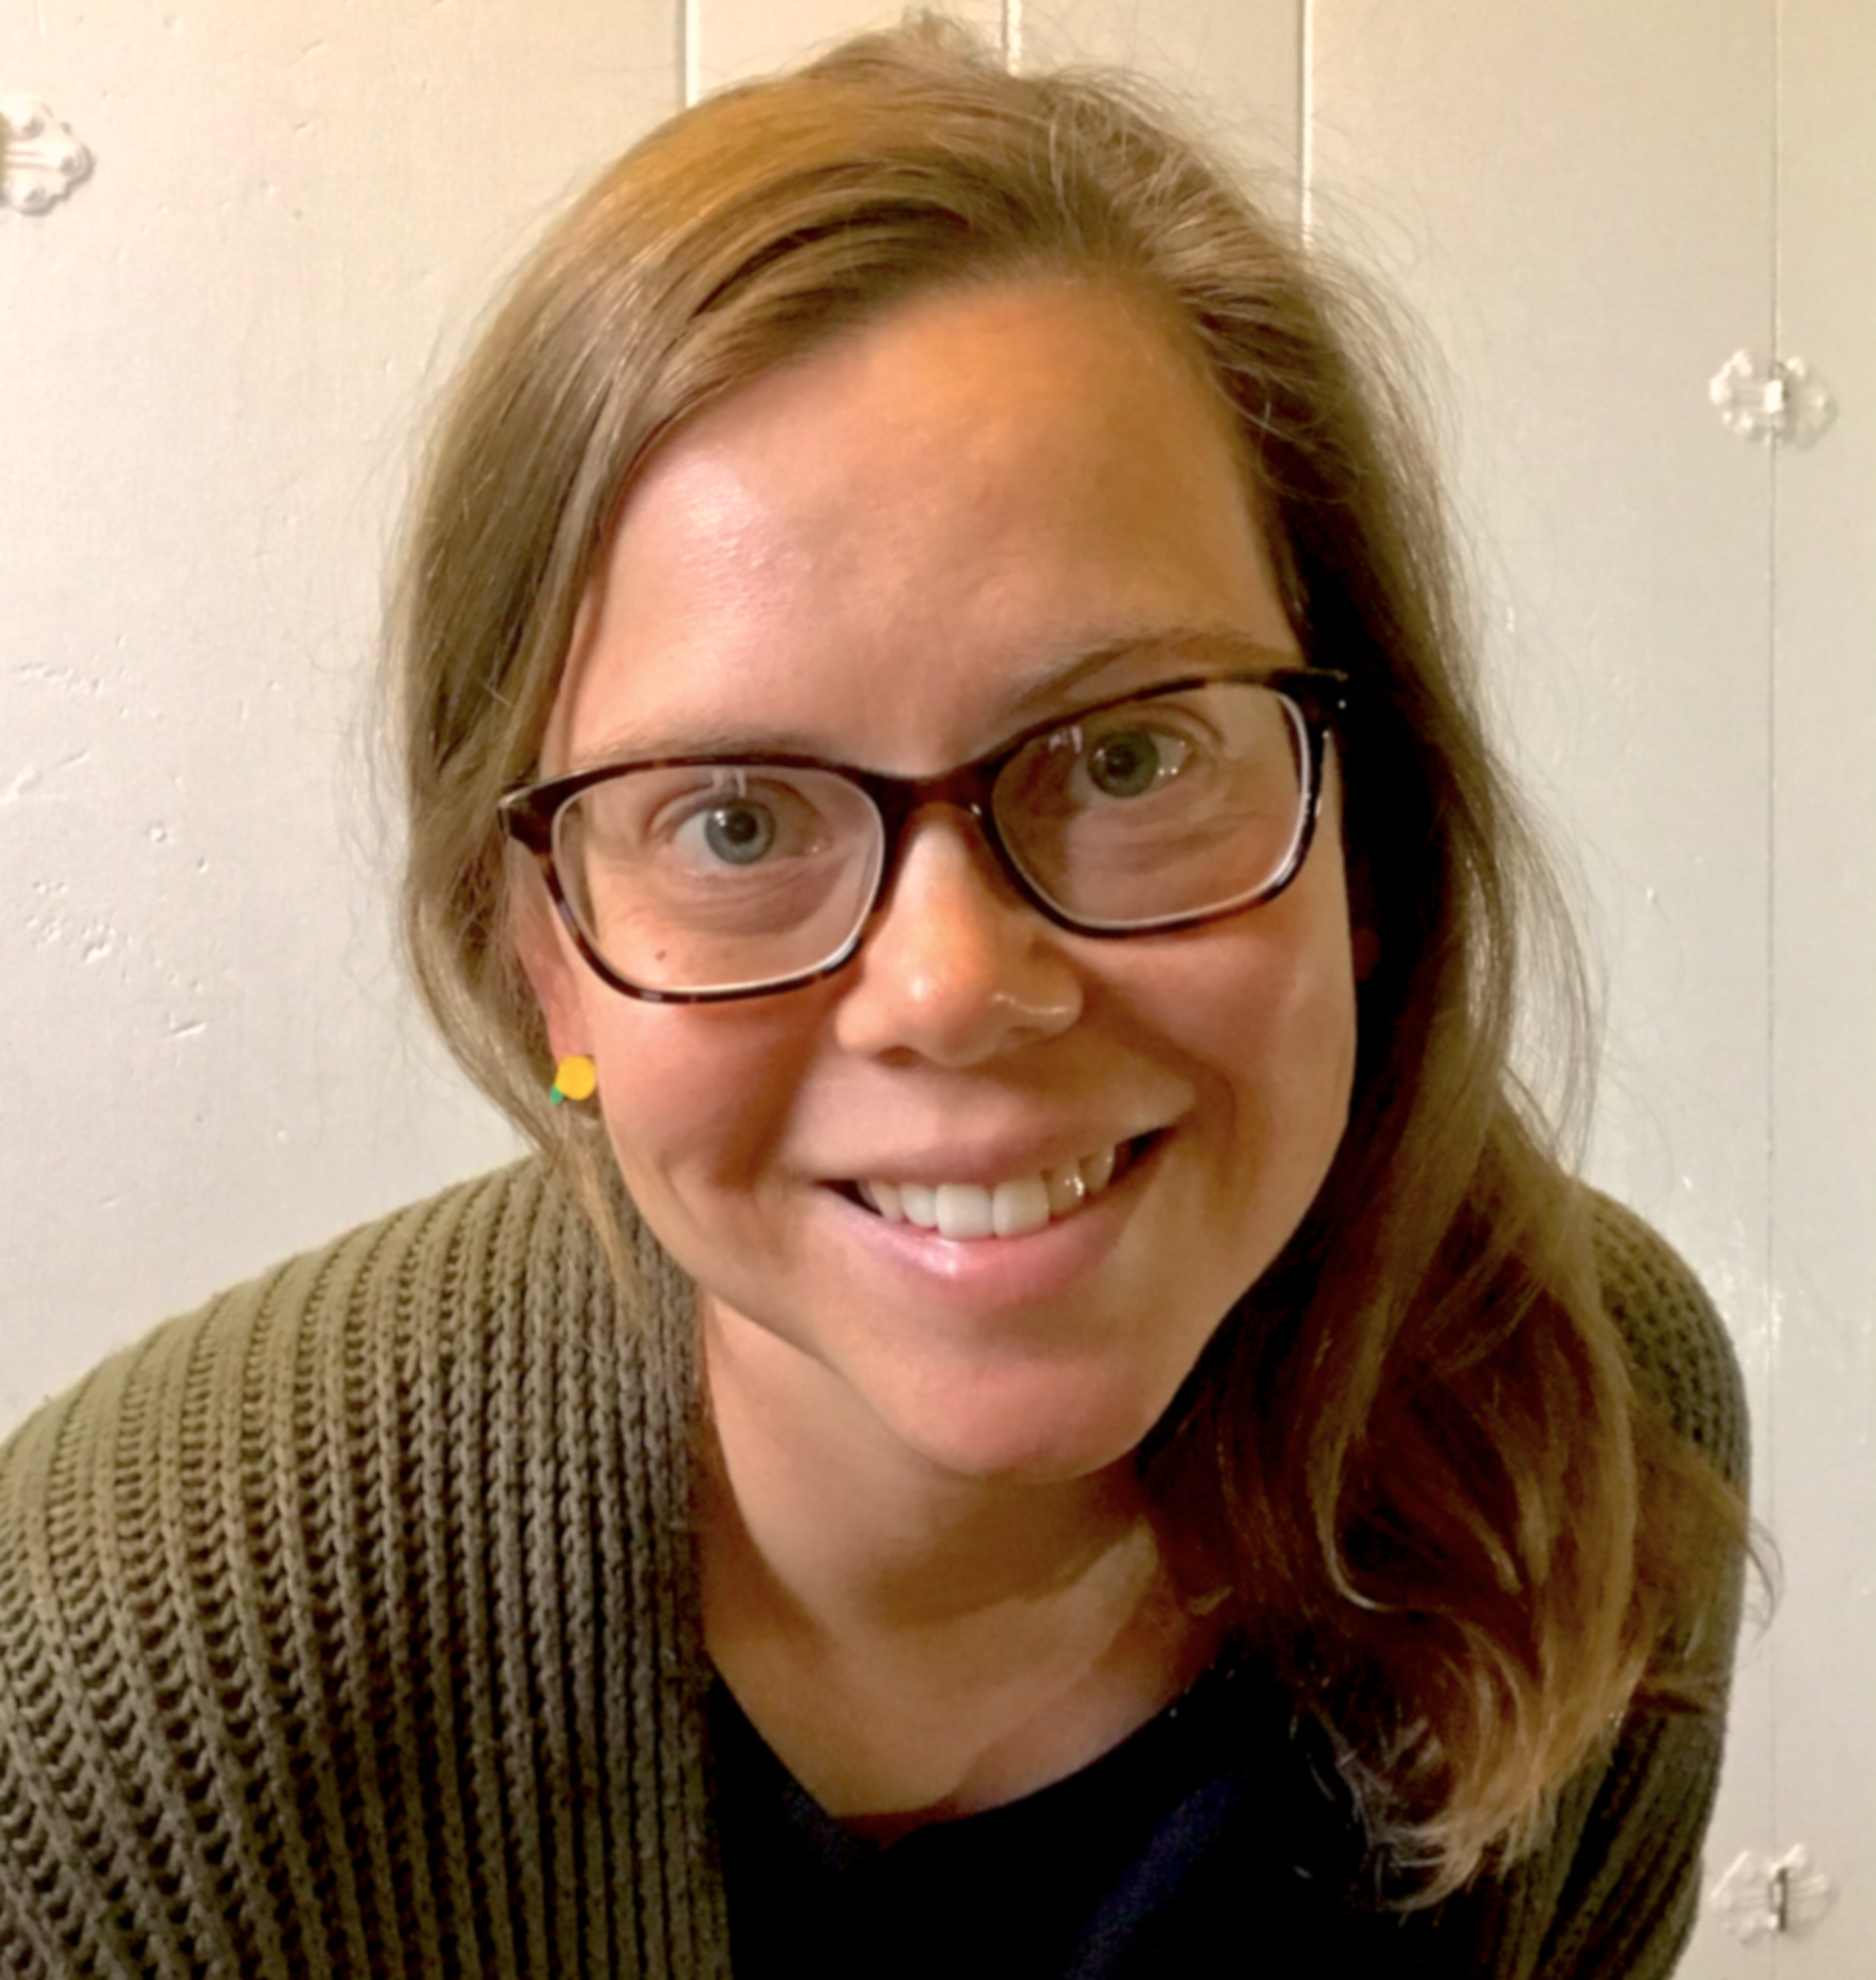 Sarah Romoslawski